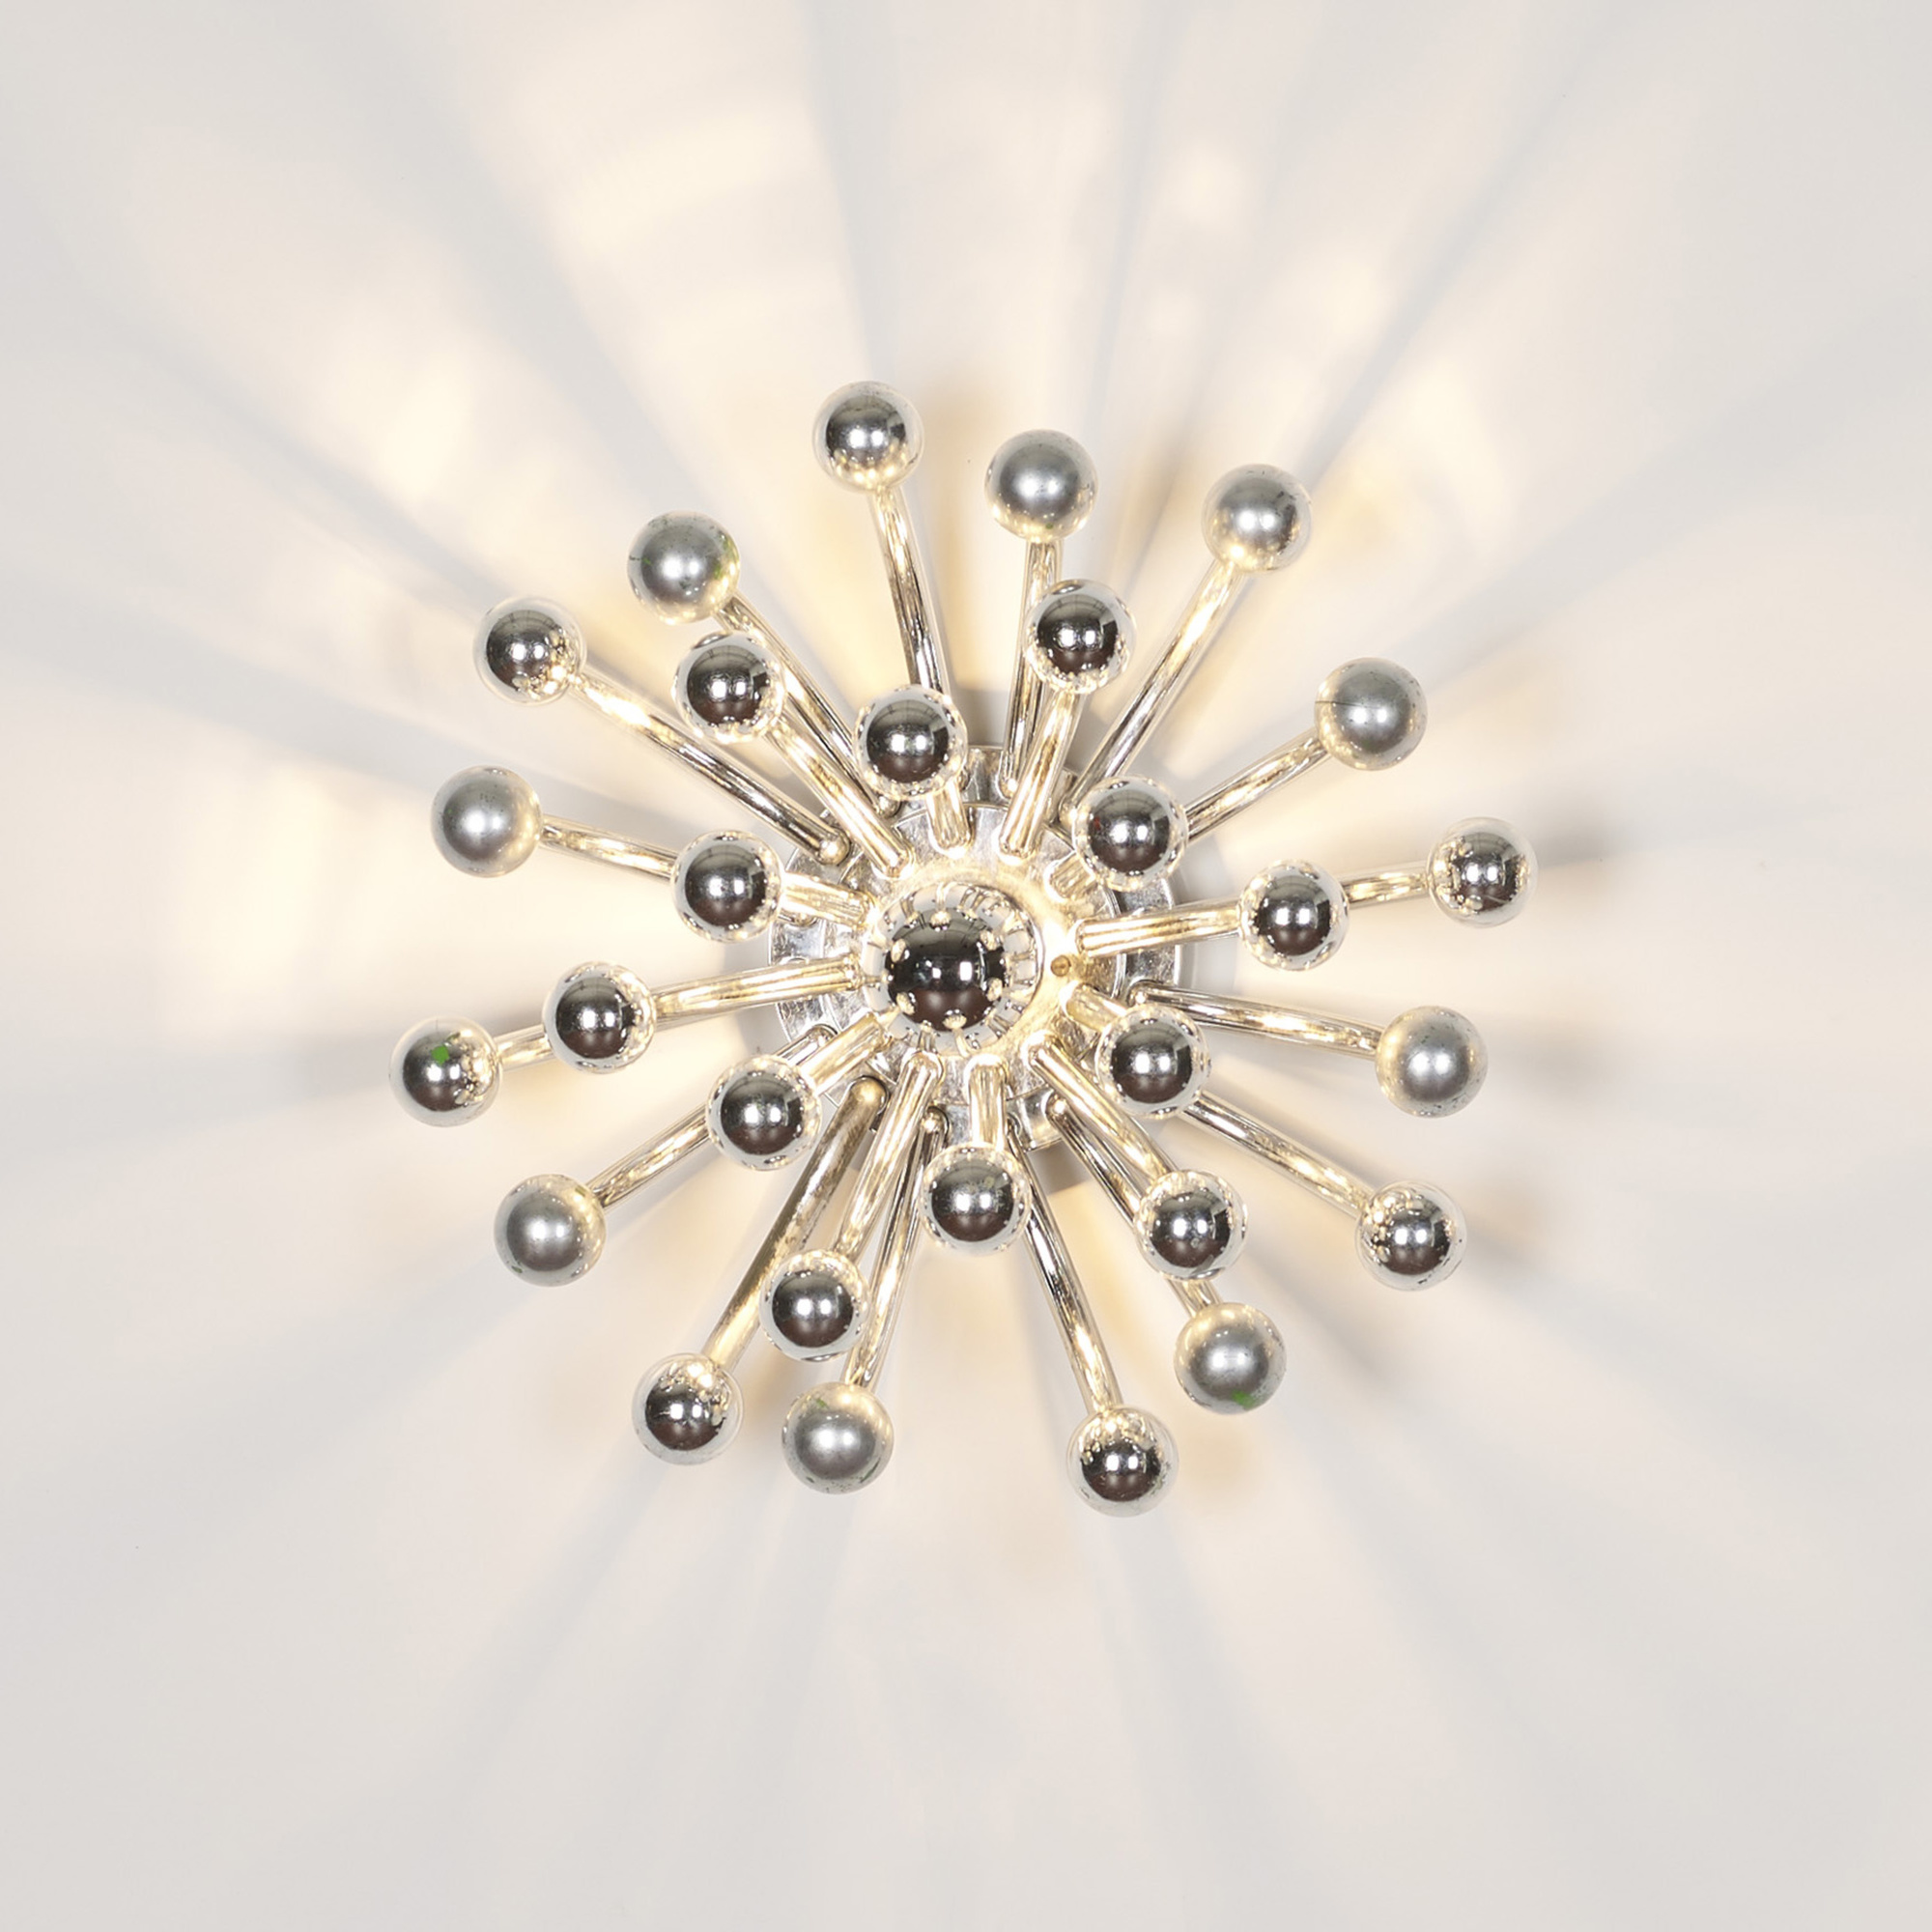 745: Studio Tetrarch / Pistillo lamps, pair (2 of 3)